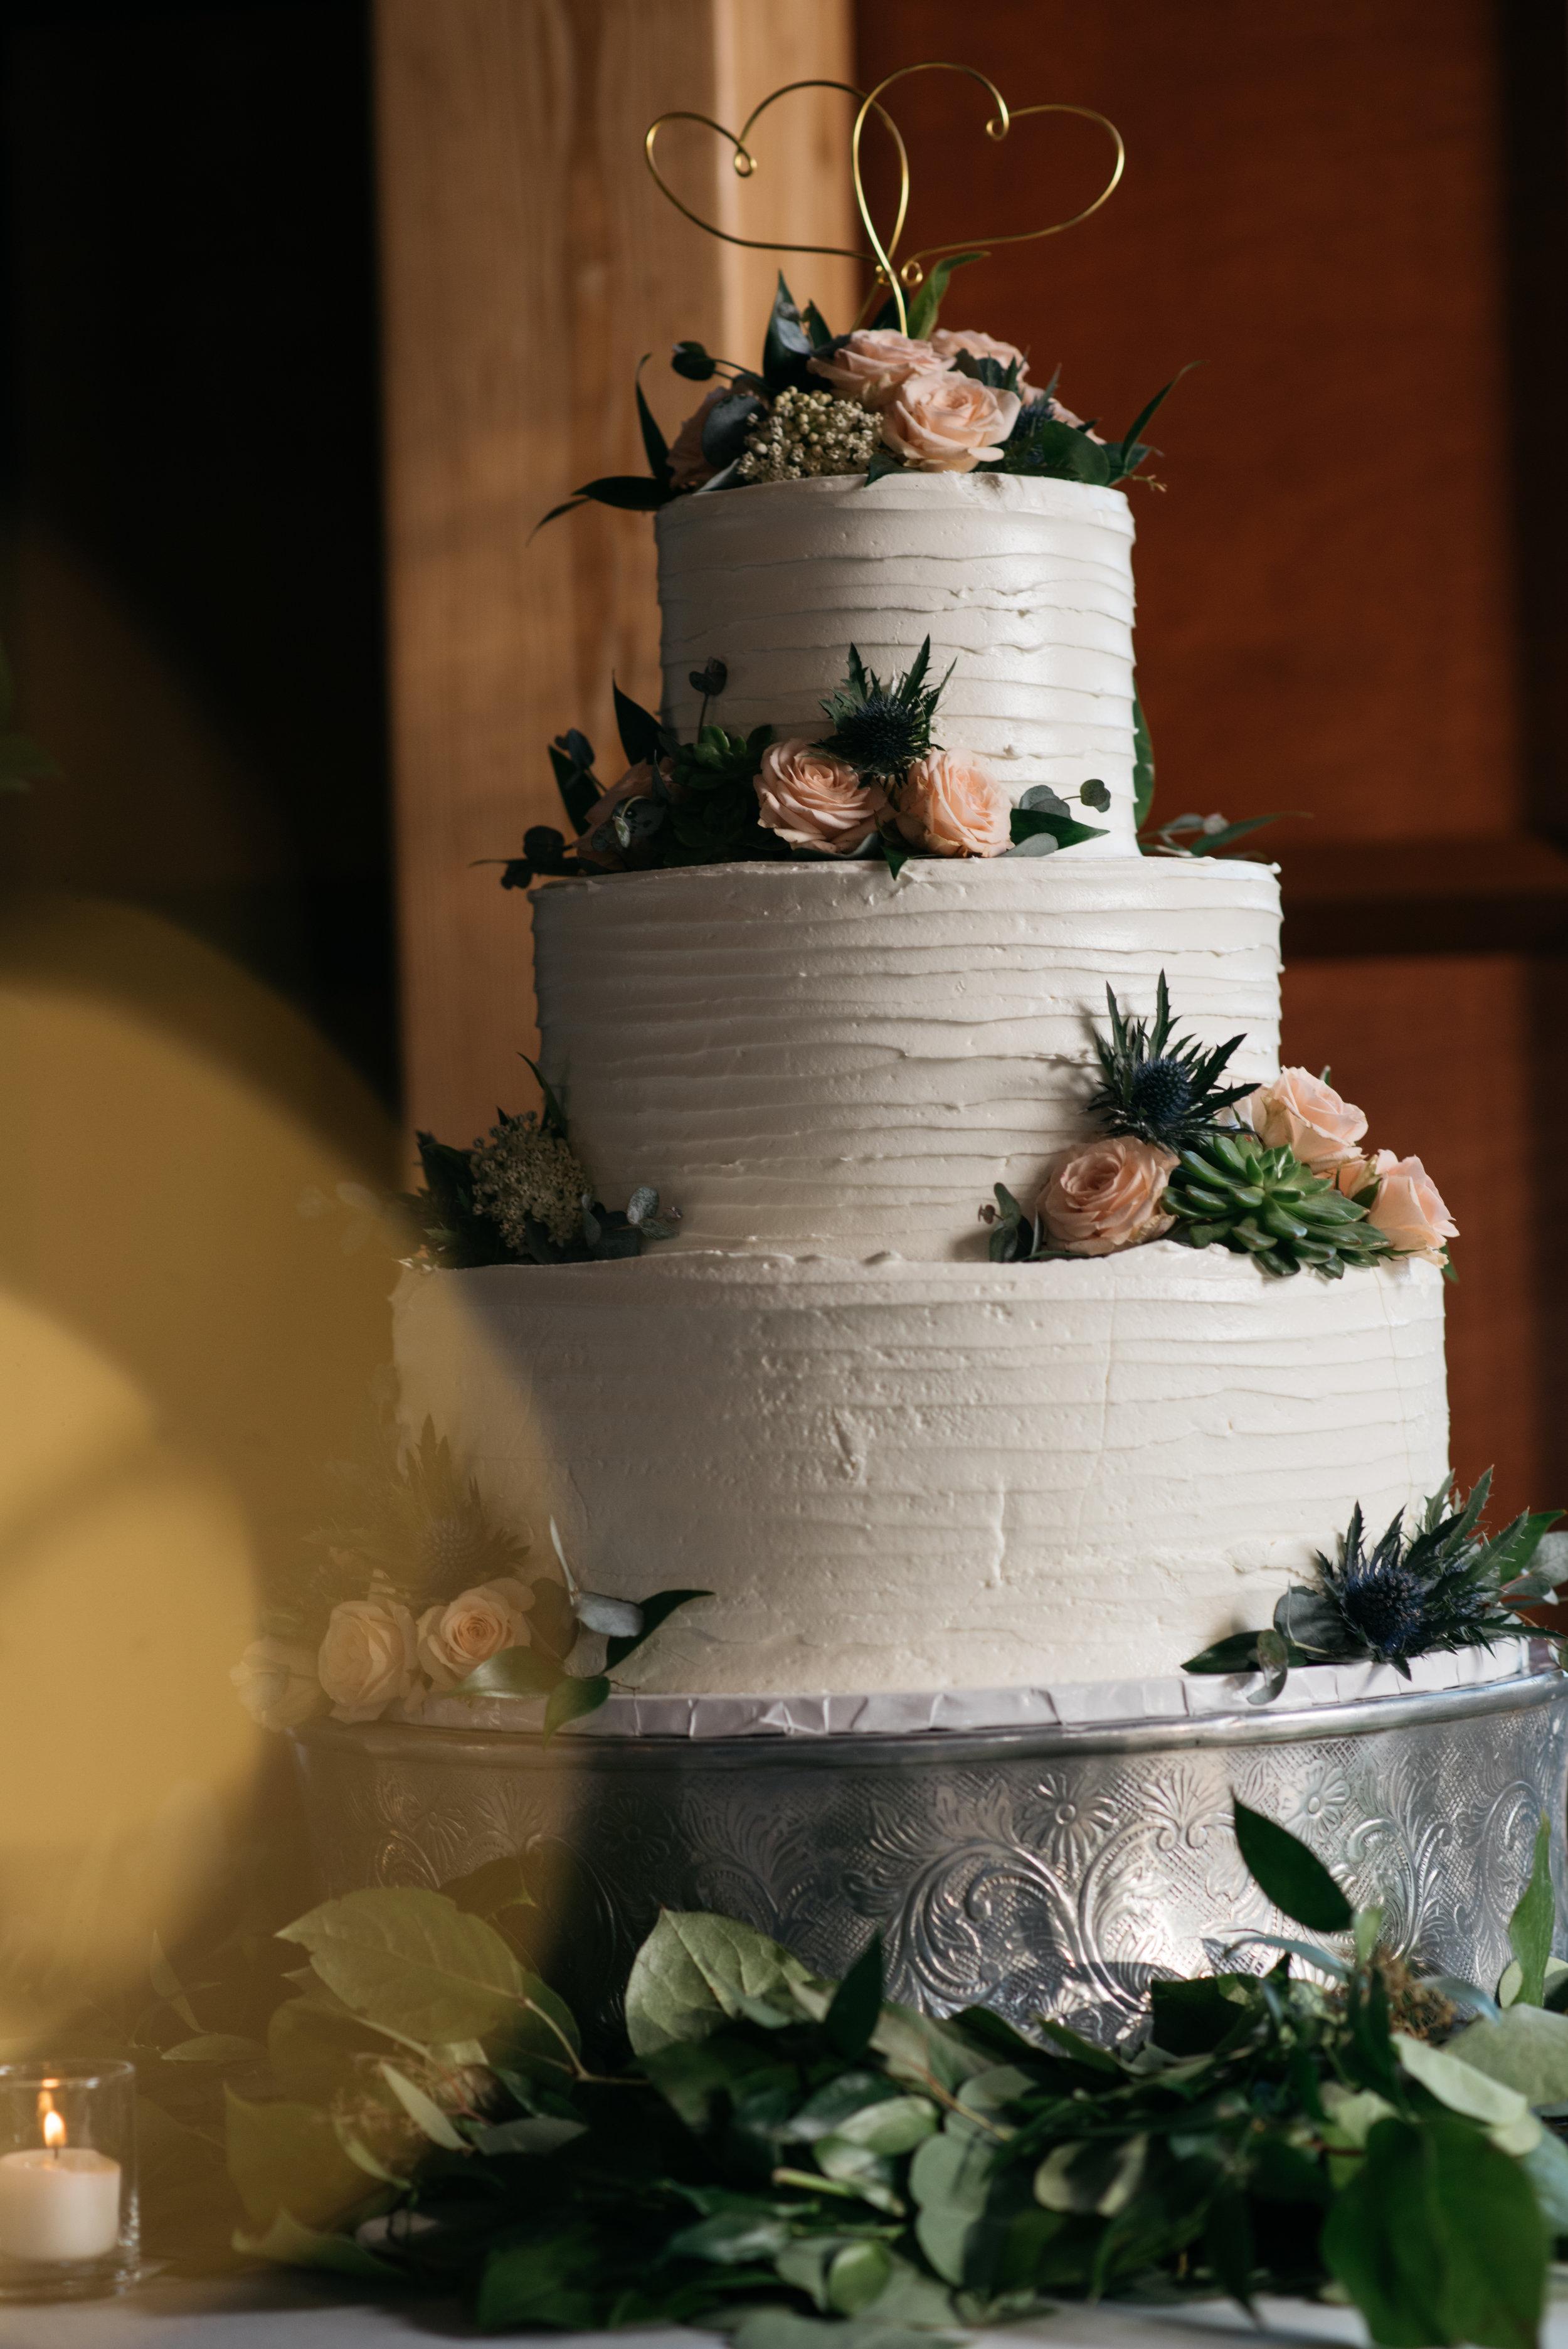 WeddingPhotos | NJPhotographer | Highlights-8-6.jpg